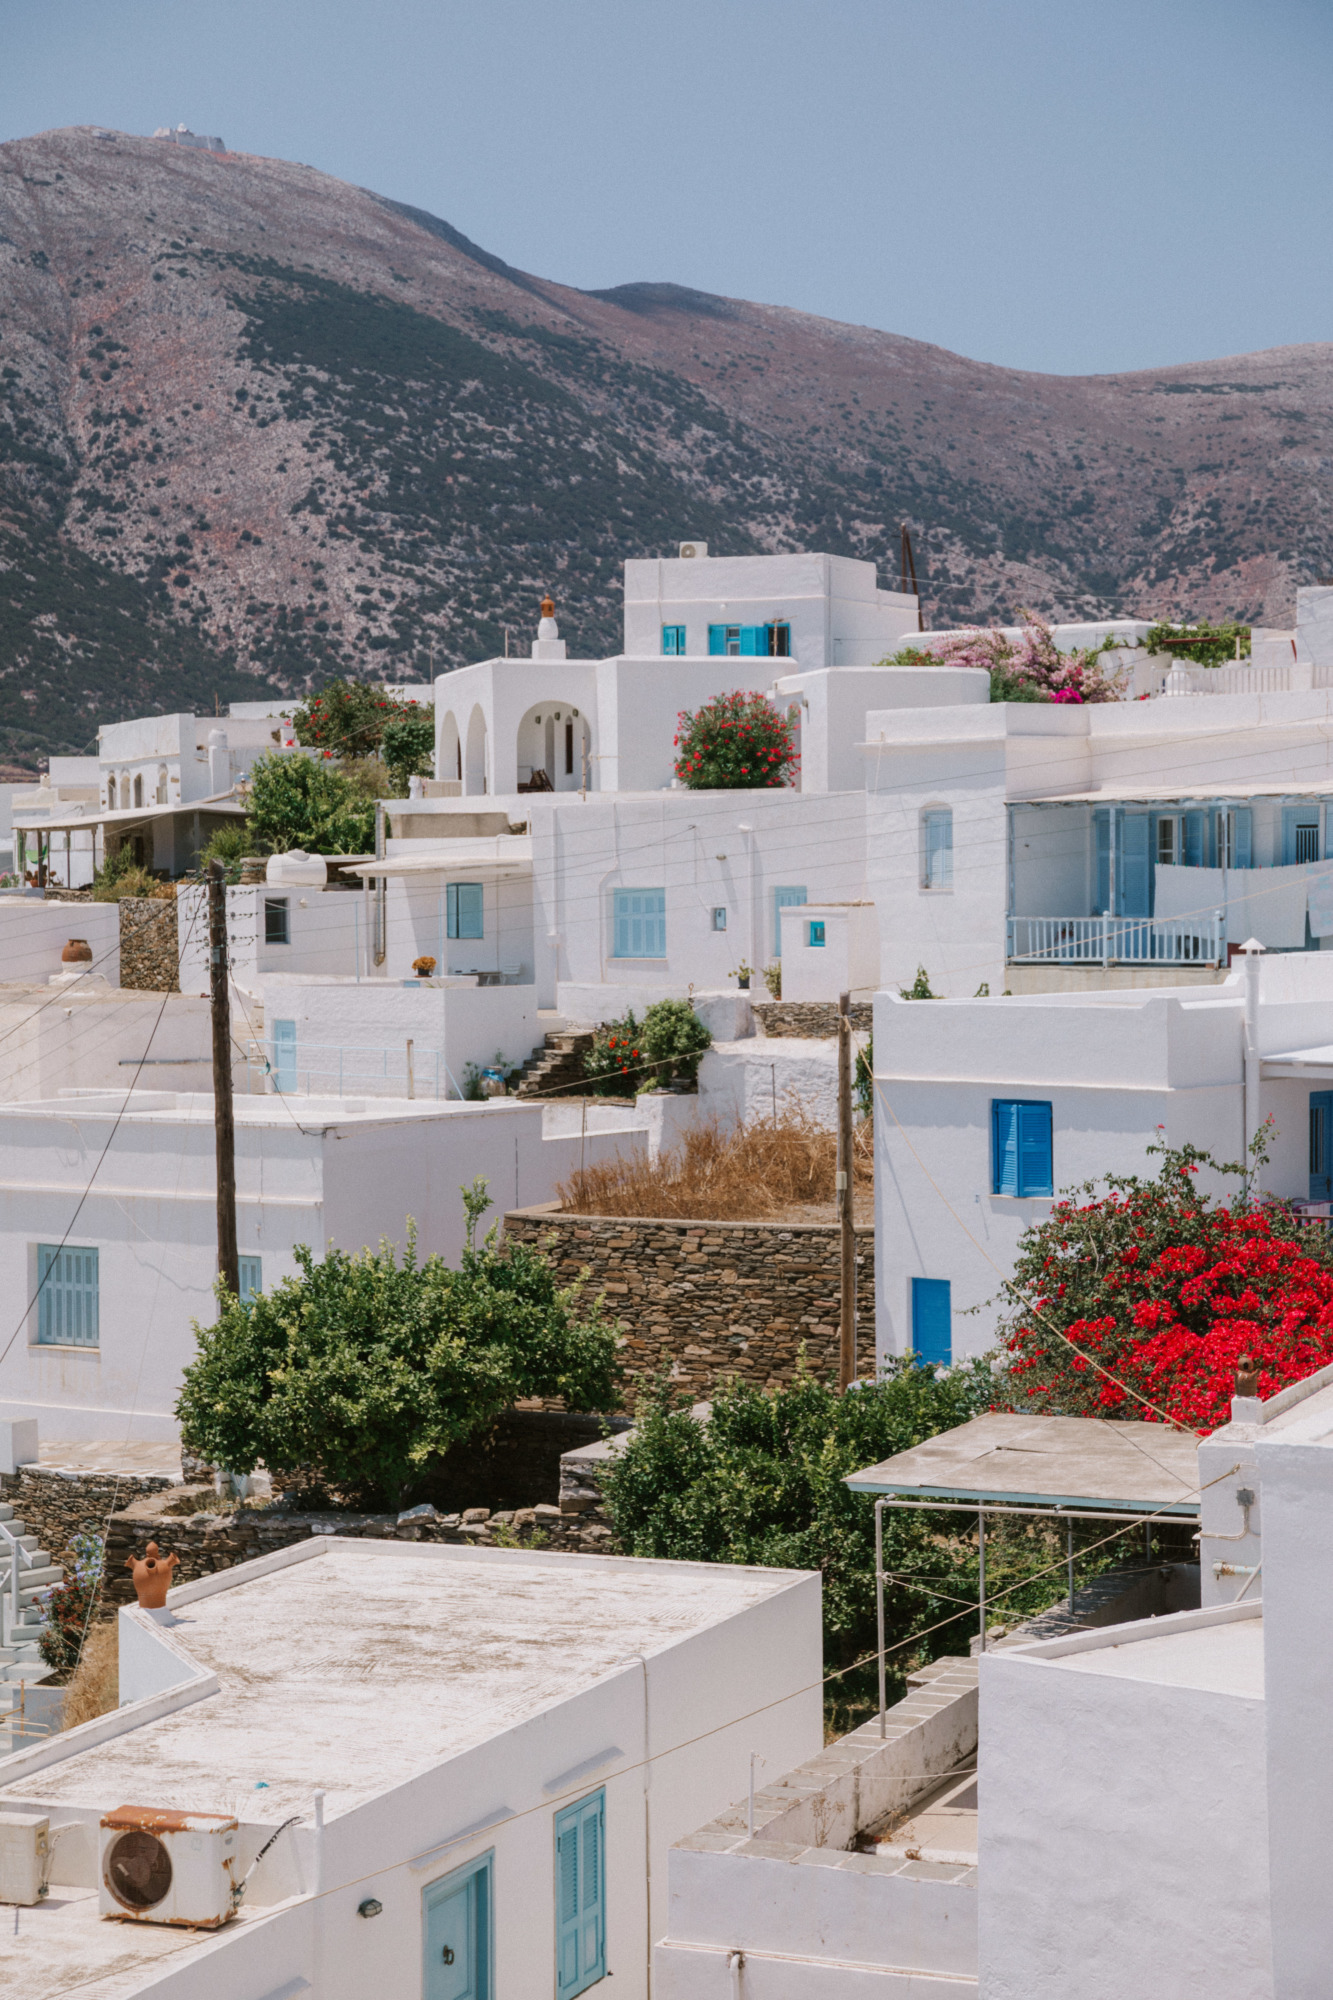 Village Apollonia Sifnos - Blondie Baby blog voyages